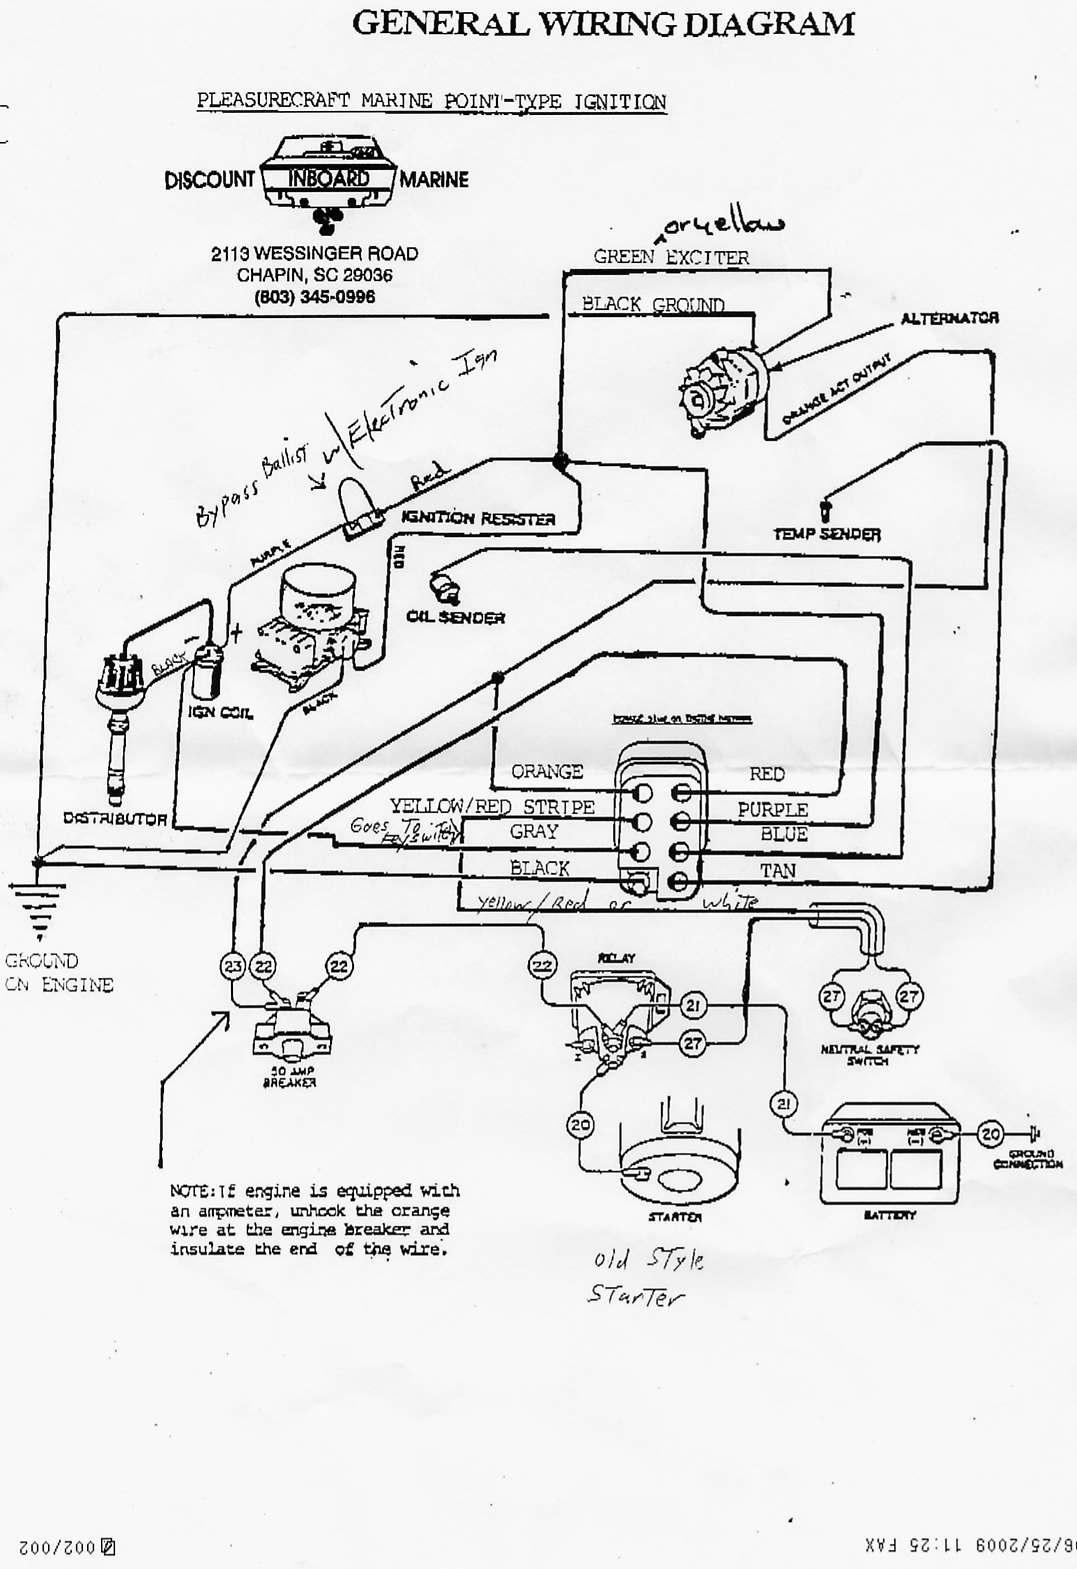 Ignition Switch - 82 Ski Nautique - Correctcraftfan Forums - Boat Ignition Switch Wiring Diagram